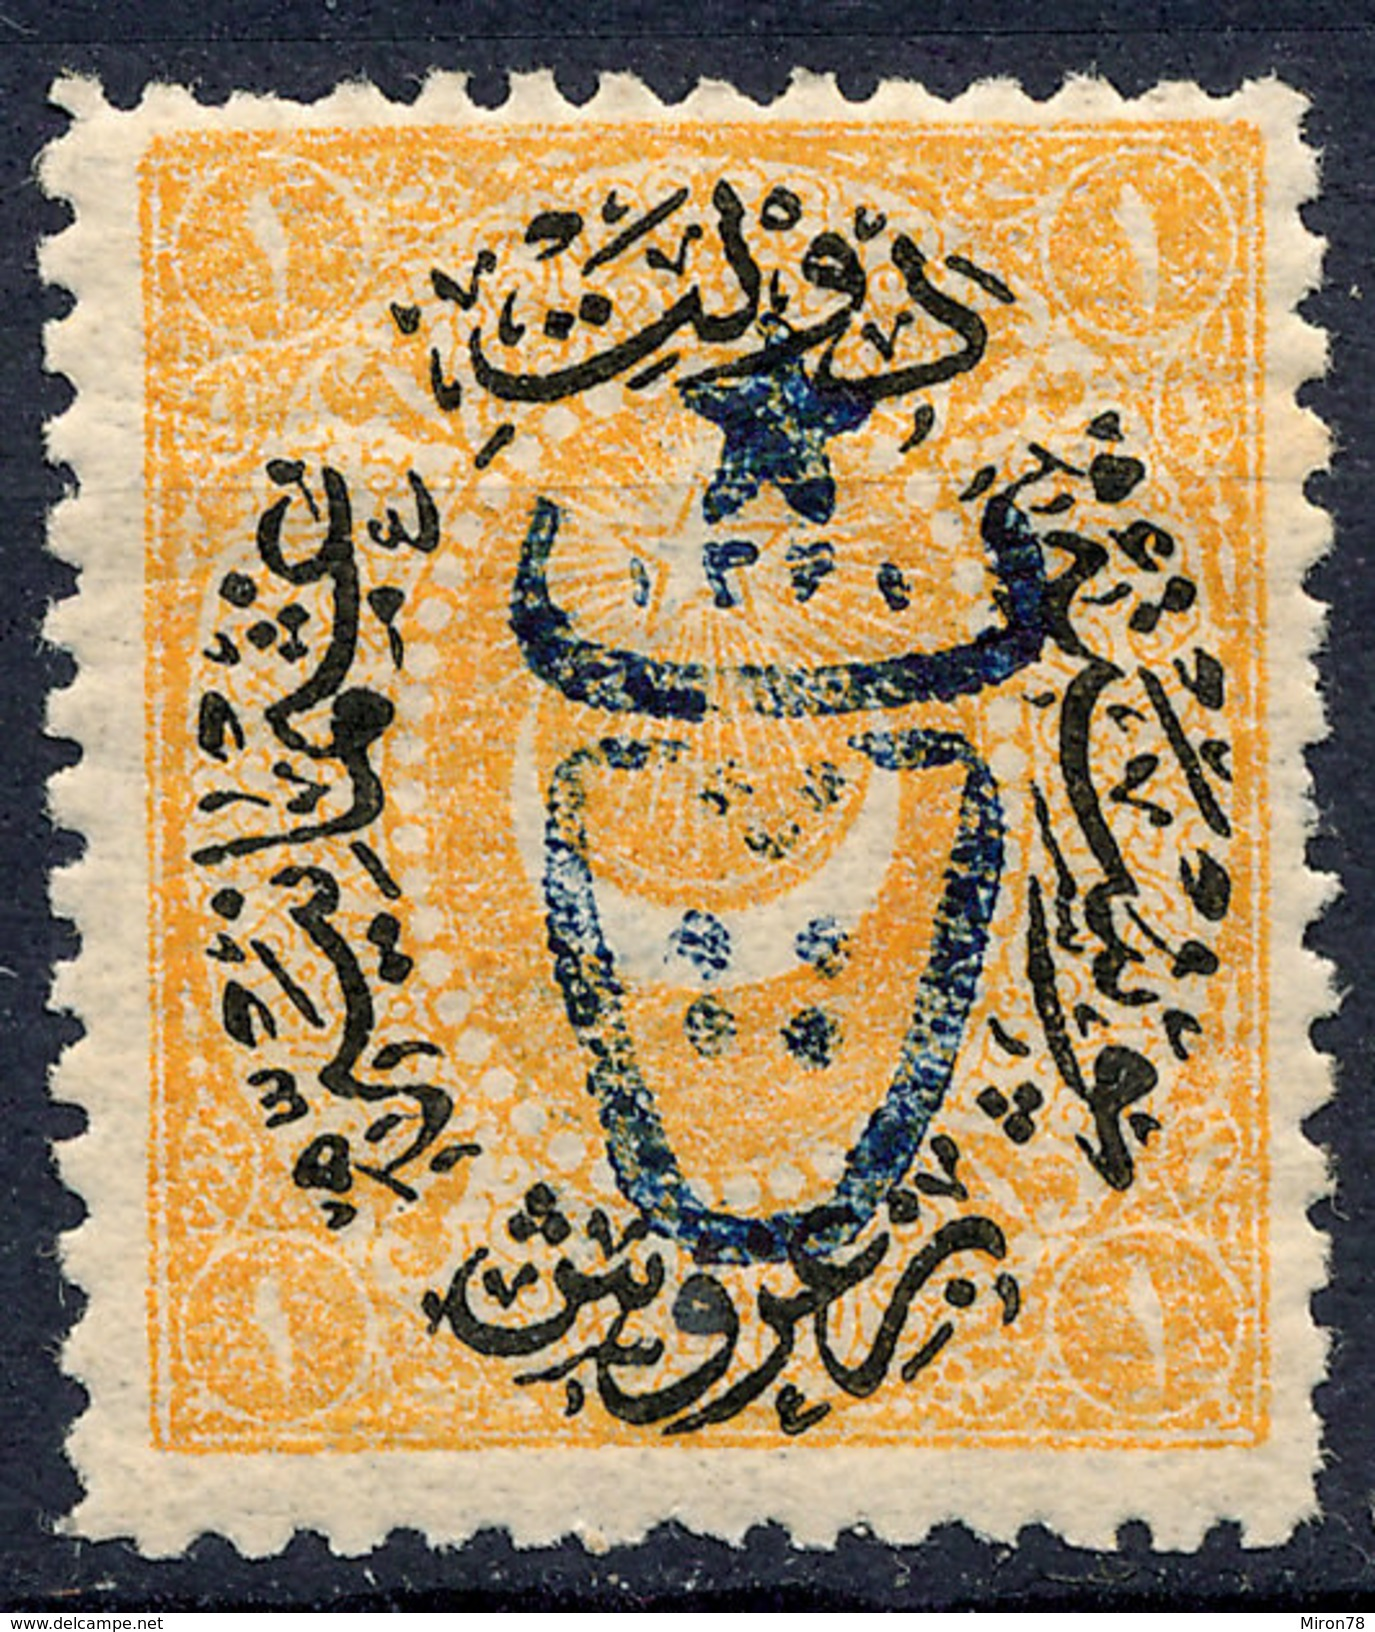 Stamp Turkey Overprint  Lot#54 - 1858-1921 Ottoman Empire